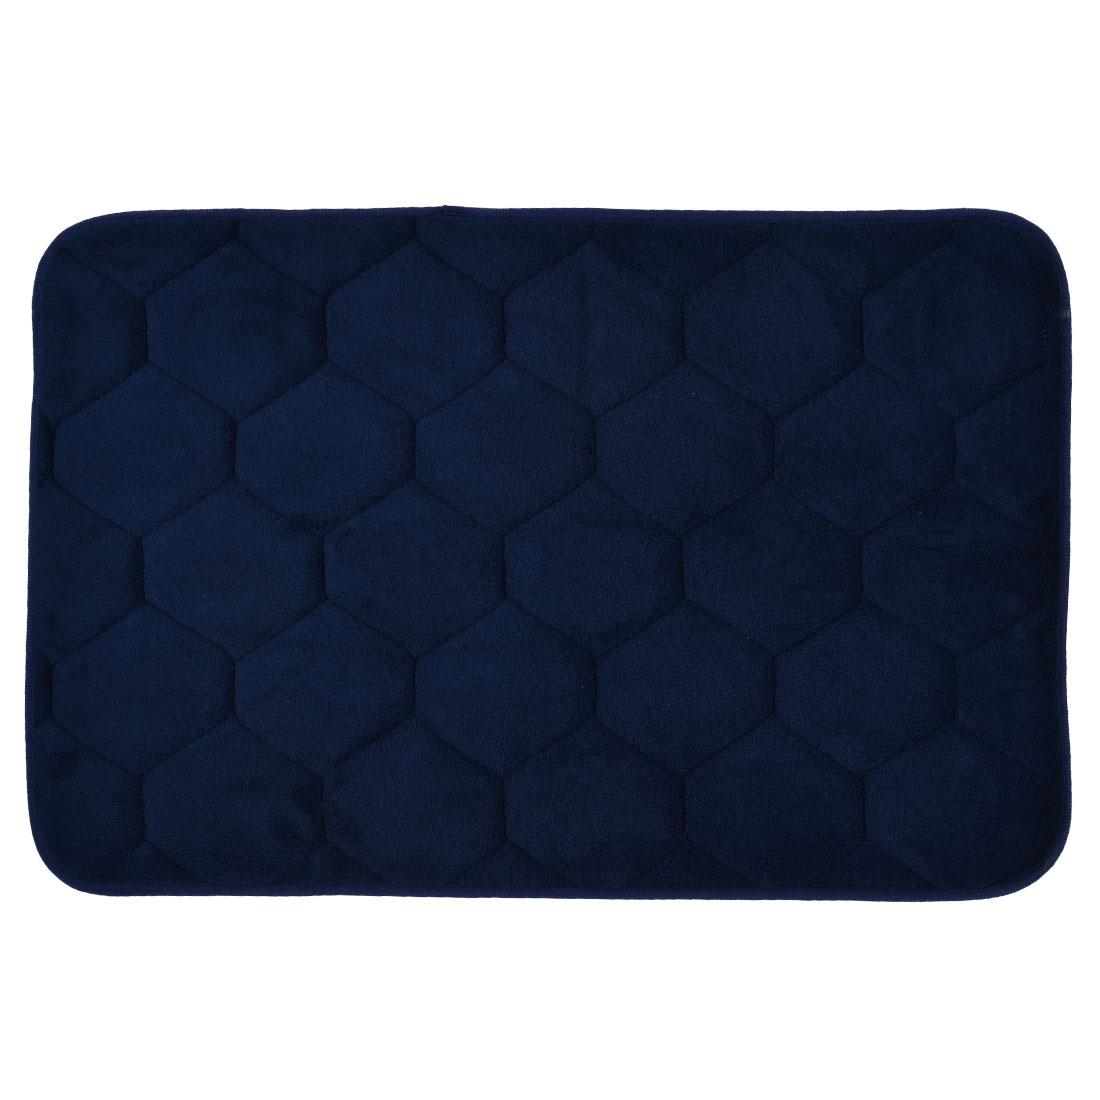 59cm x 40cm Dark Blue Polyester Hexagon Pattern Absorbent Slip-resistant Shower Rug